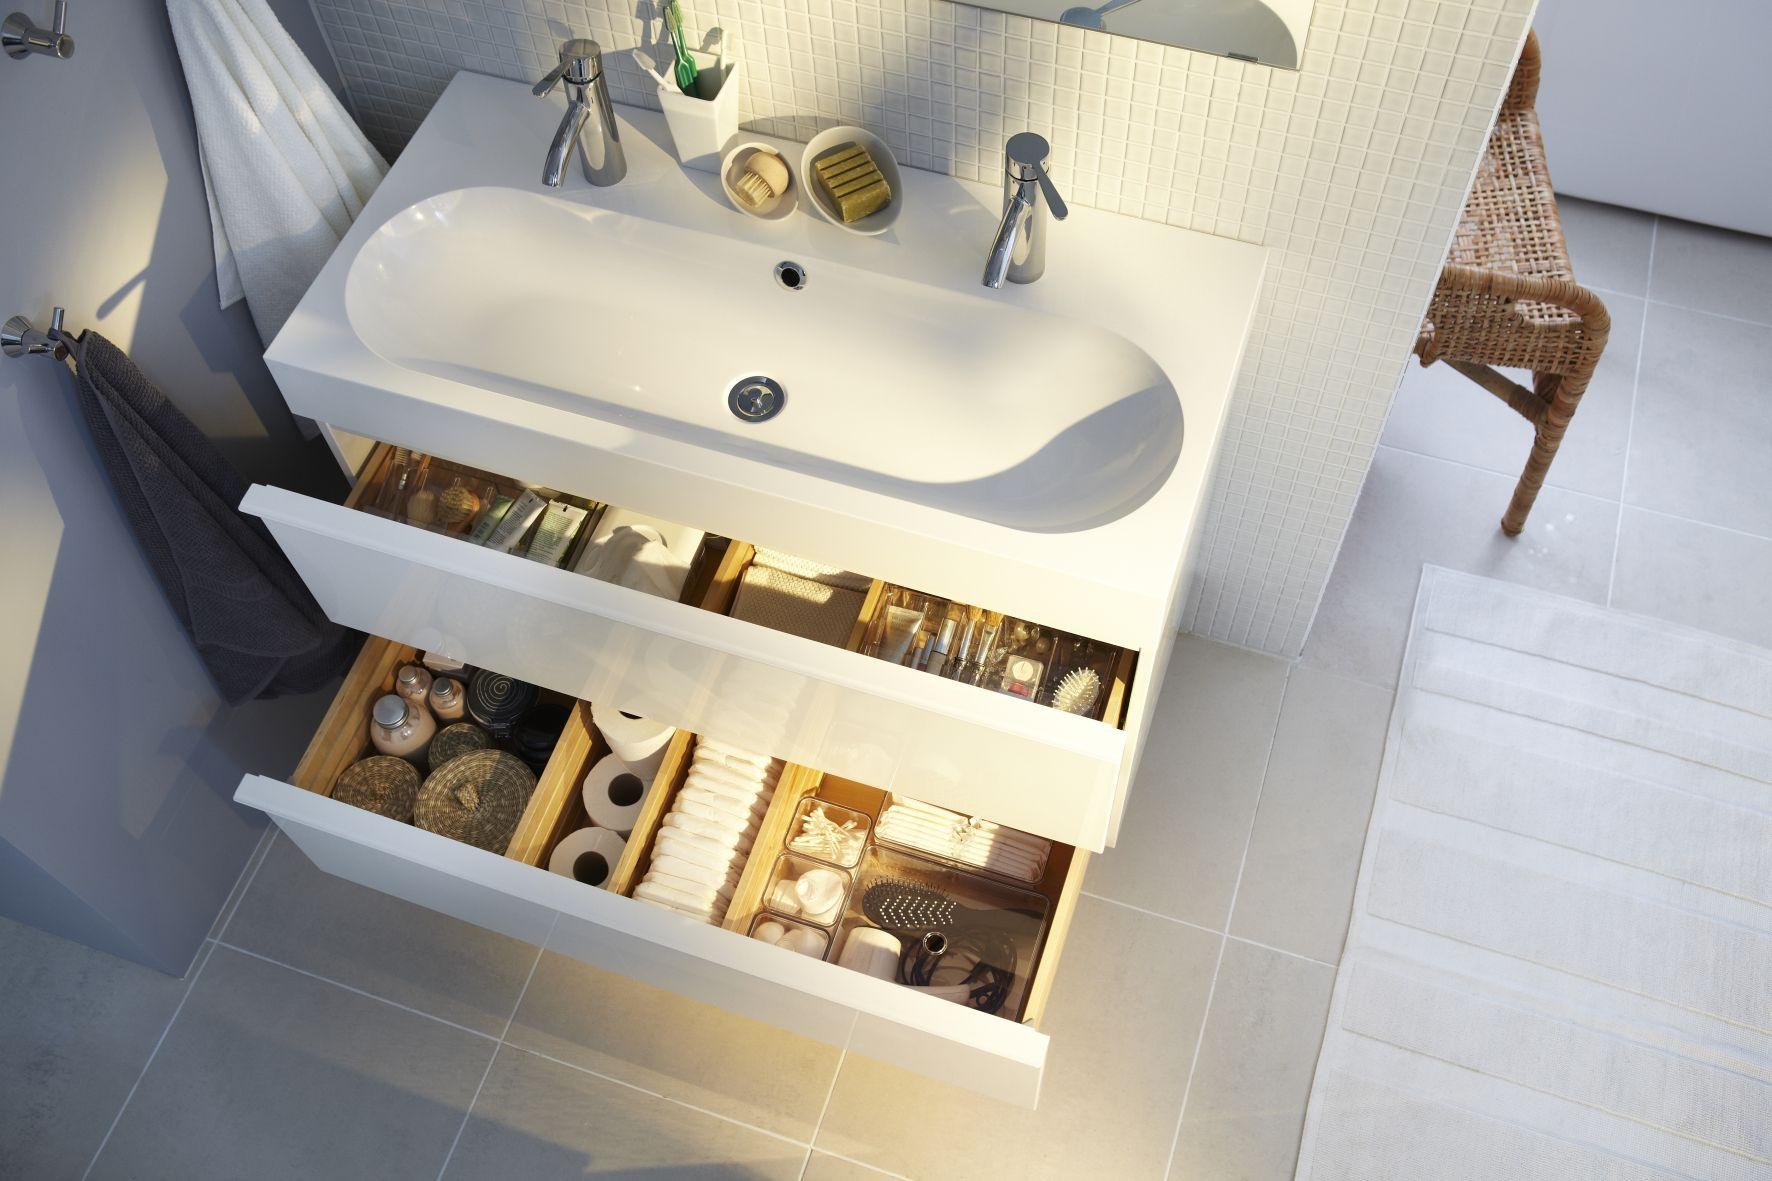 Ikea Badkamer Ikea : Godmorgon wastafelkast ikea badkamer opberger make a house